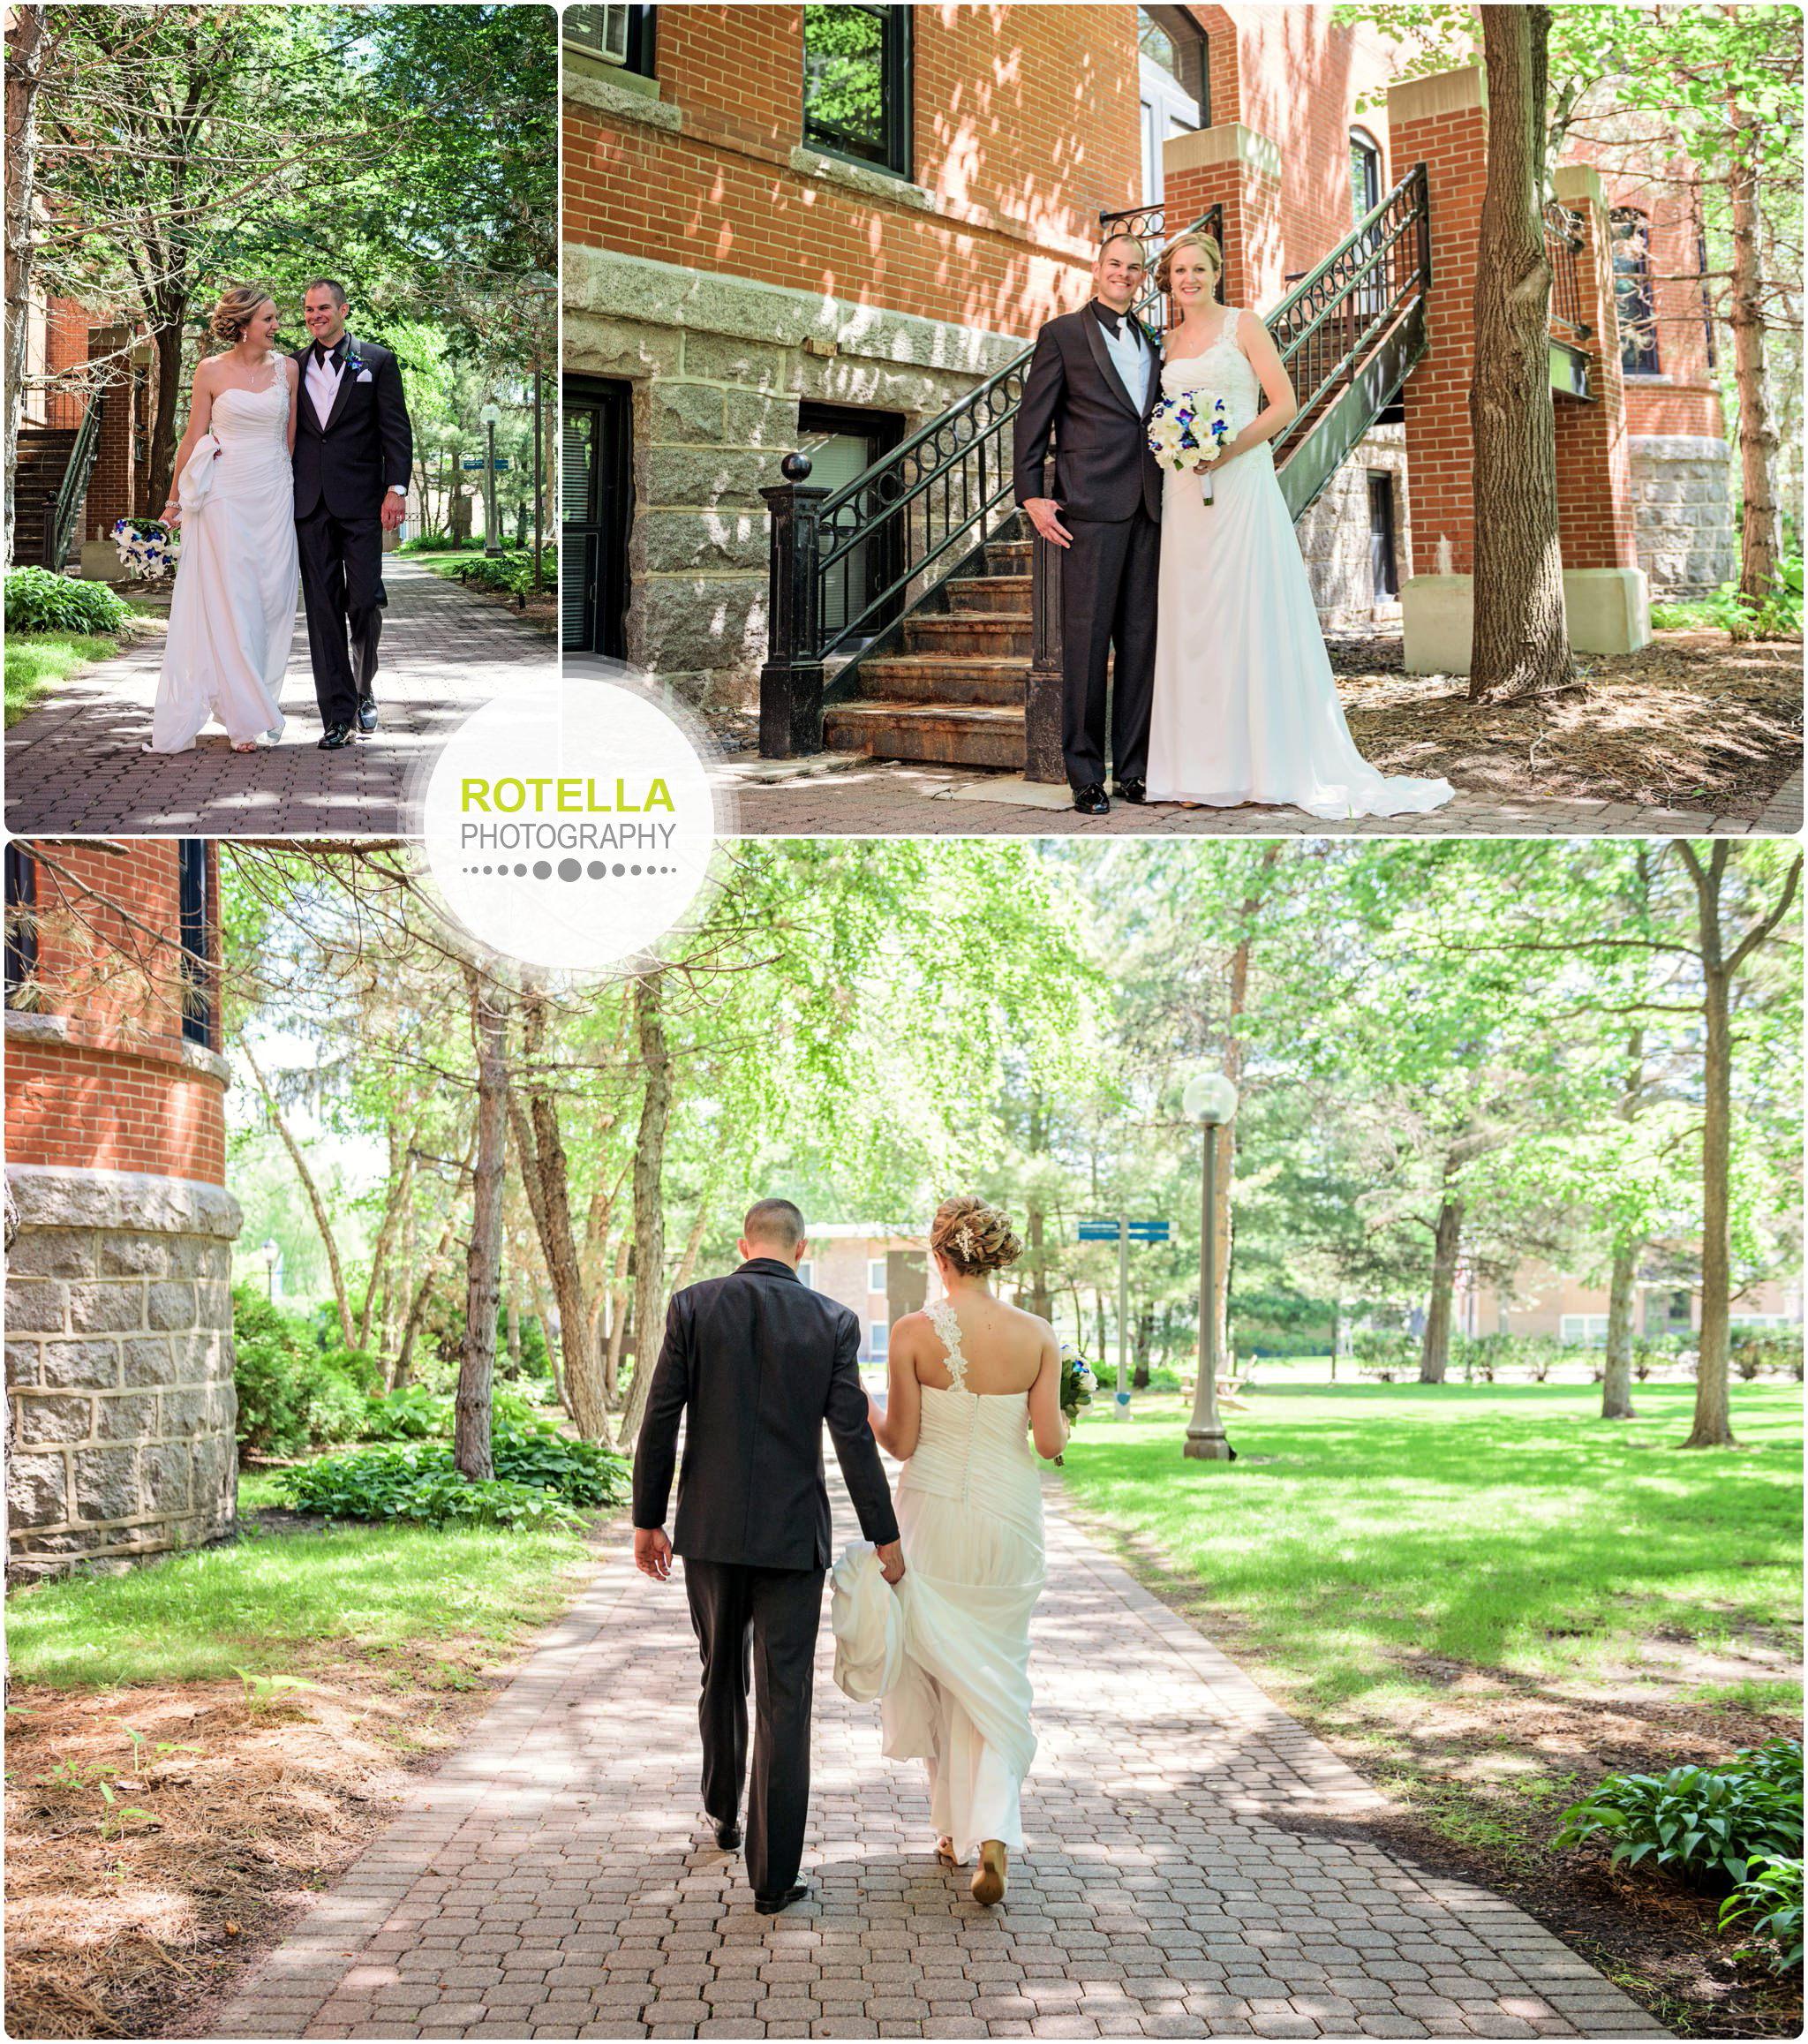 A College of St. Benedict's Wedding outdoor portraits walking